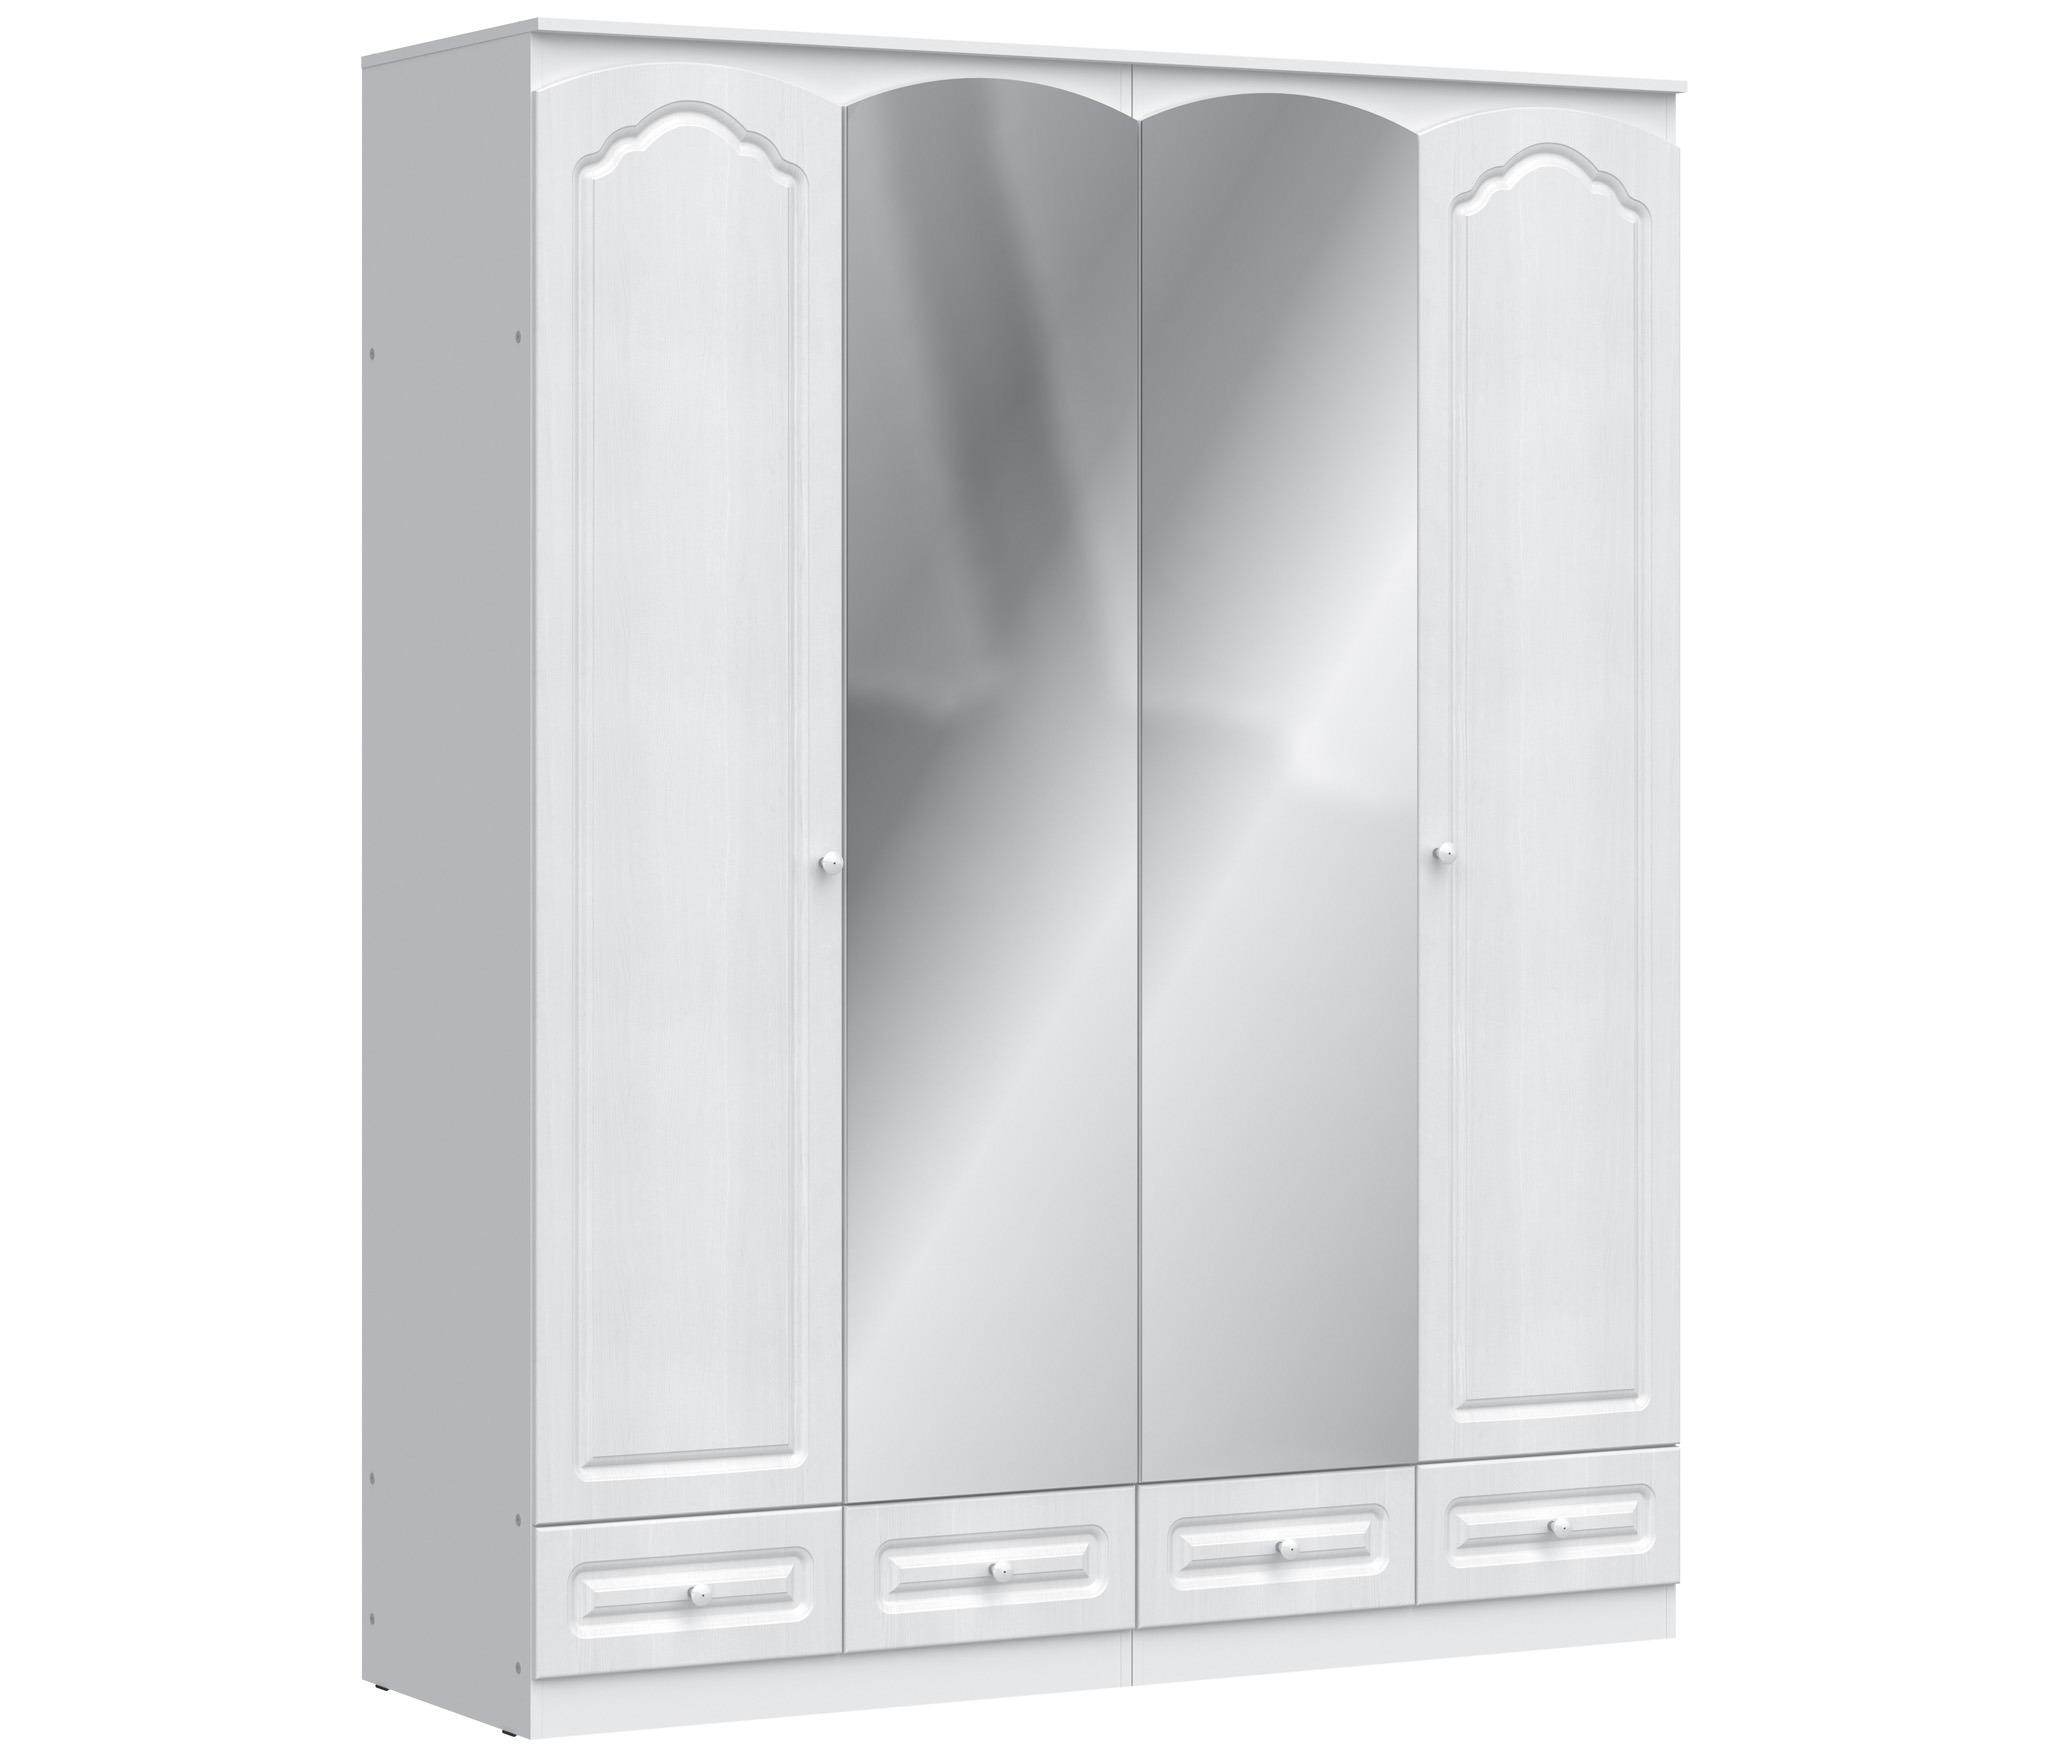 Амалия Комплект шкафовШкафы<br><br><br>Длина мм: 0<br>Высота мм: 0<br>Глубина мм: 0